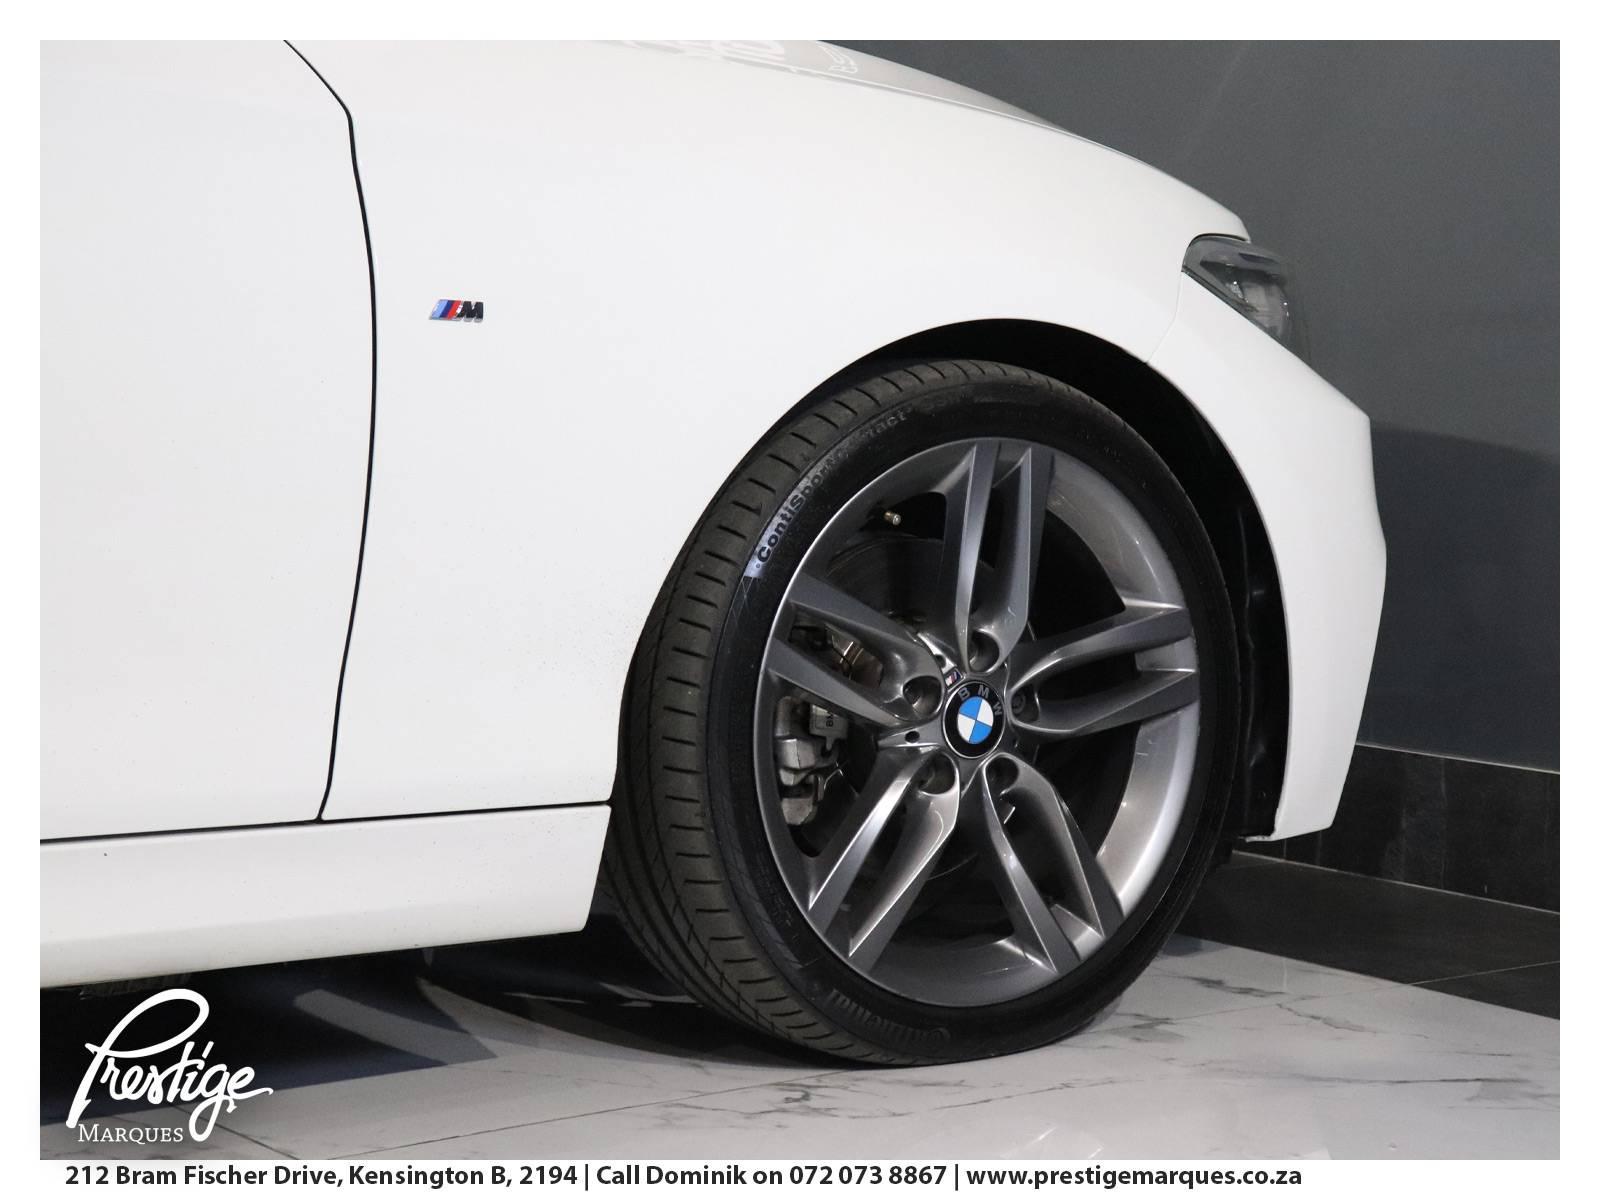 2015_BMW-2 series-220d-Prestige-Marques-Randburg-Sandton-9